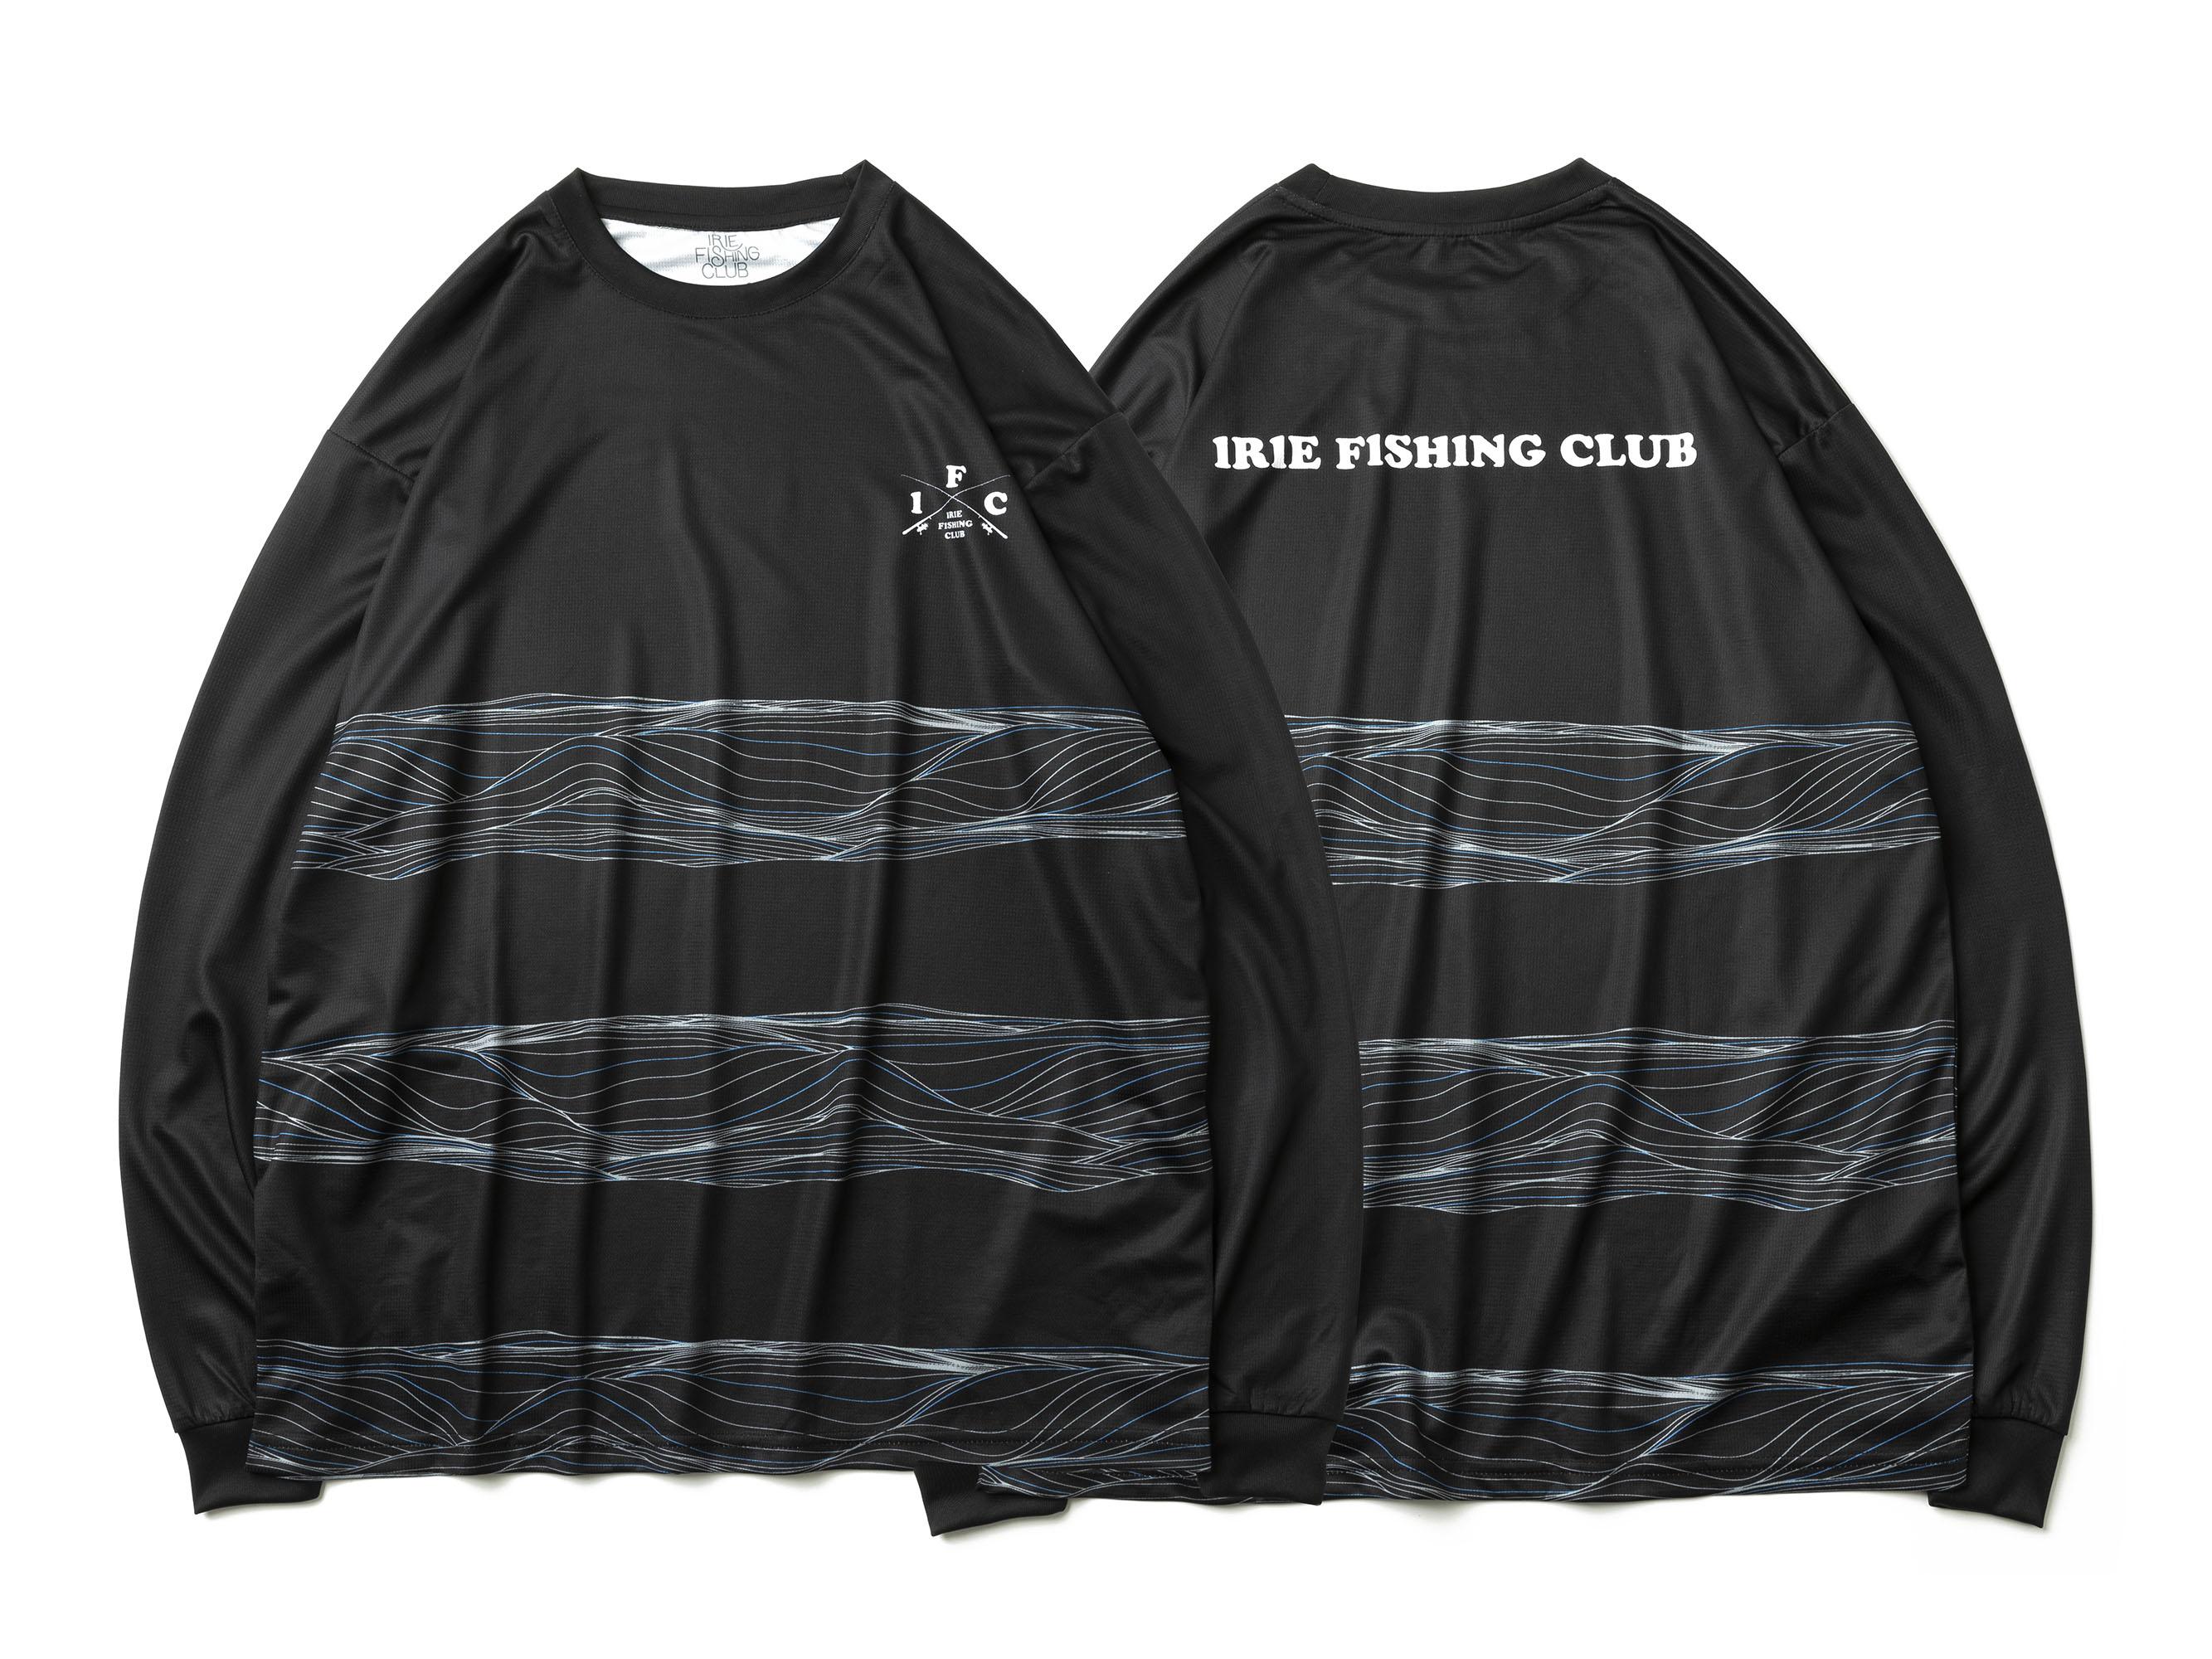 I.F.C DRY MESH L/S TEE - IRIE FISHING CLUB